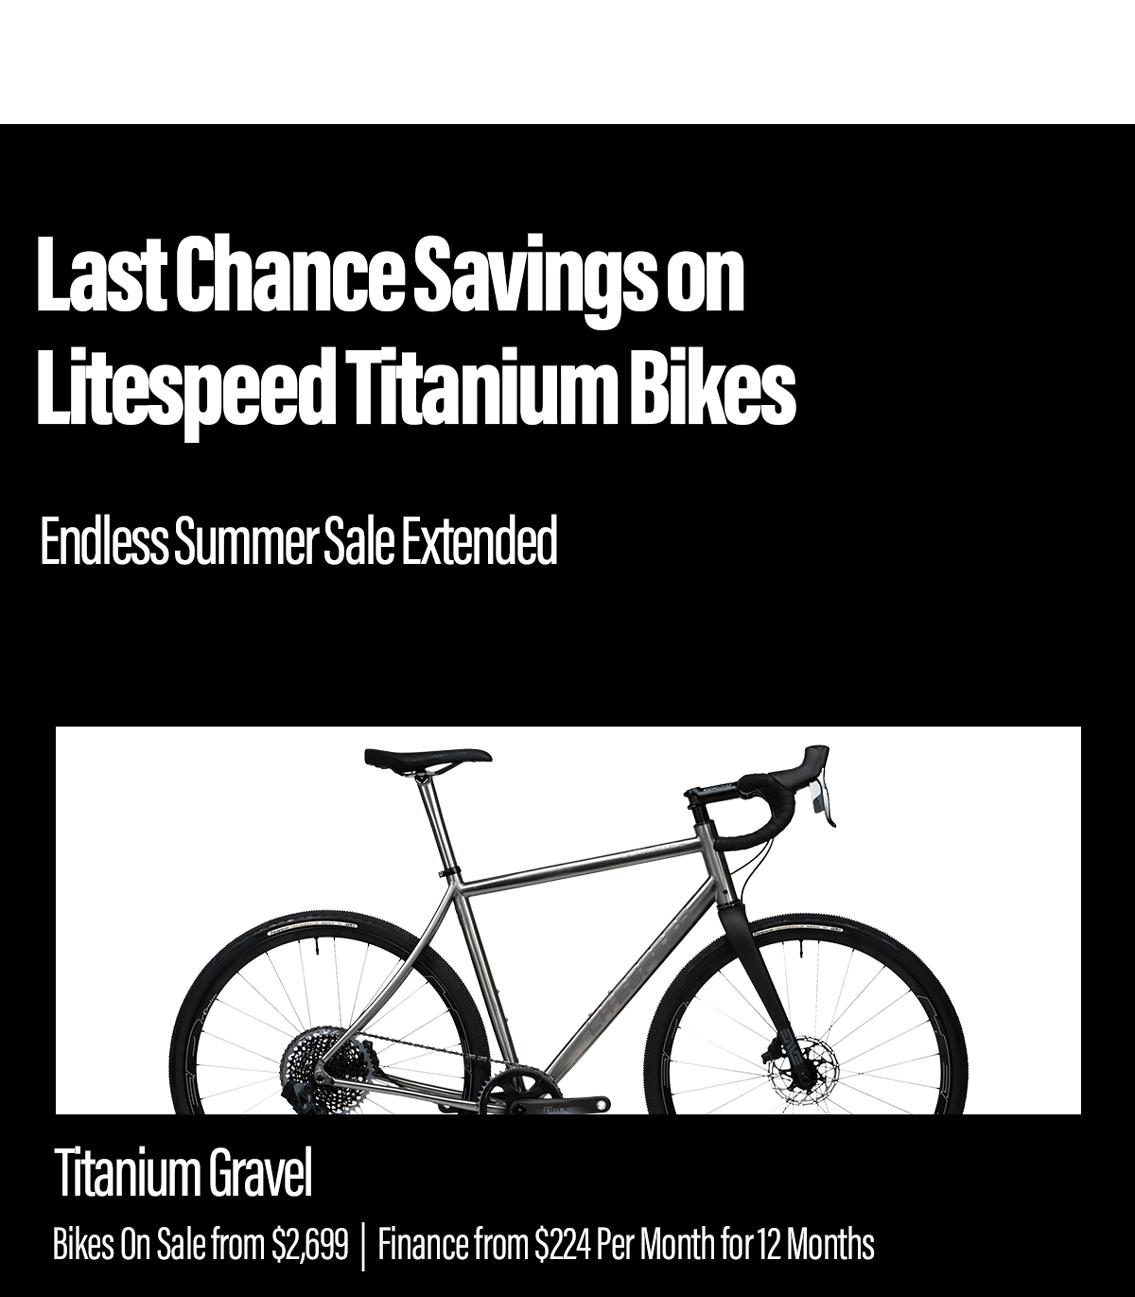 Last chance savings on titanium bikes: sale ends August 14th! Shop titanium gravel bikes from $2,699